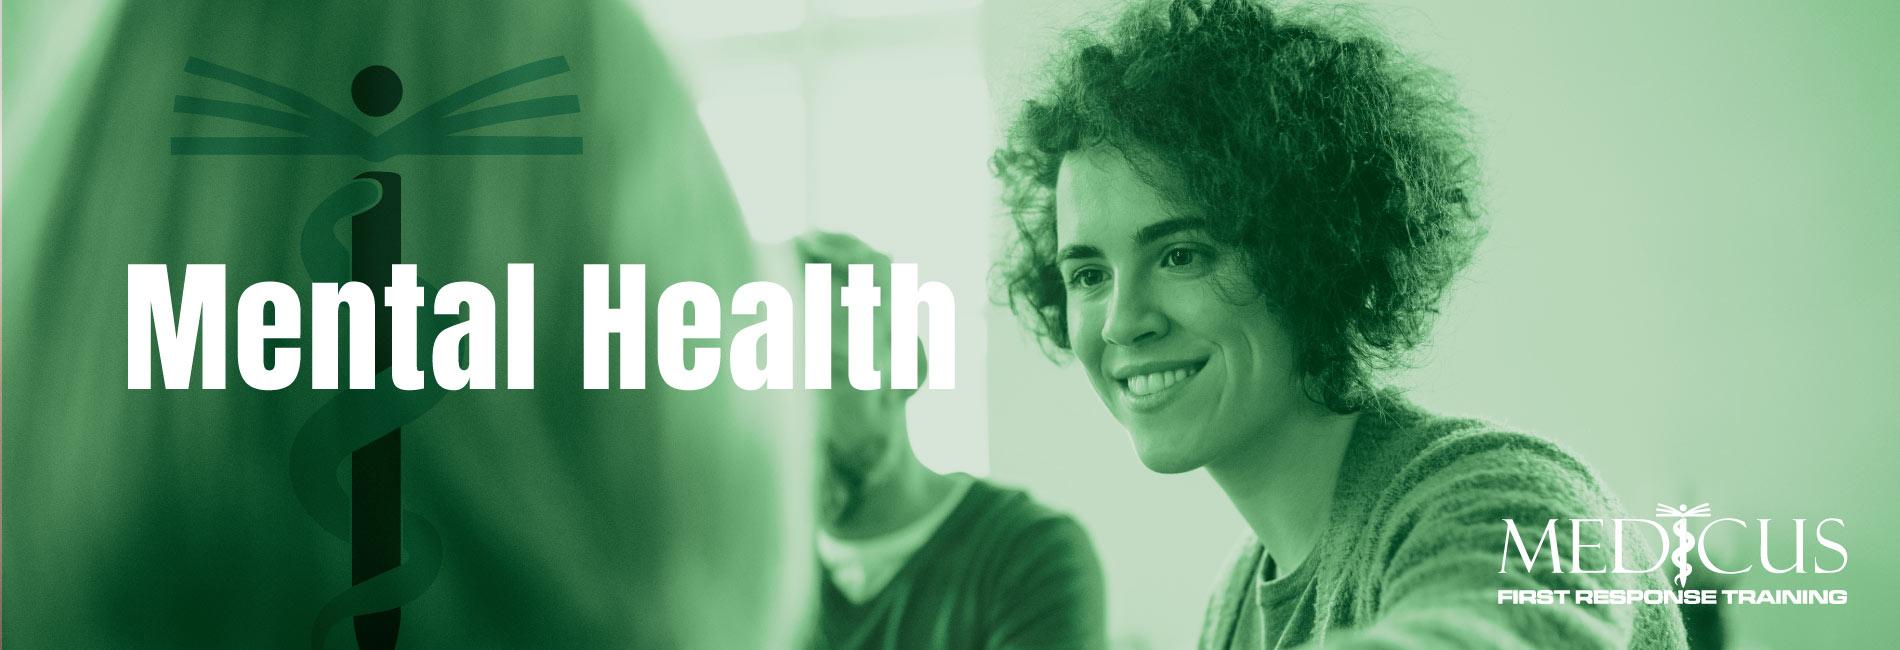 Medicus Training Mental Health Training Carmarthenshire Banner